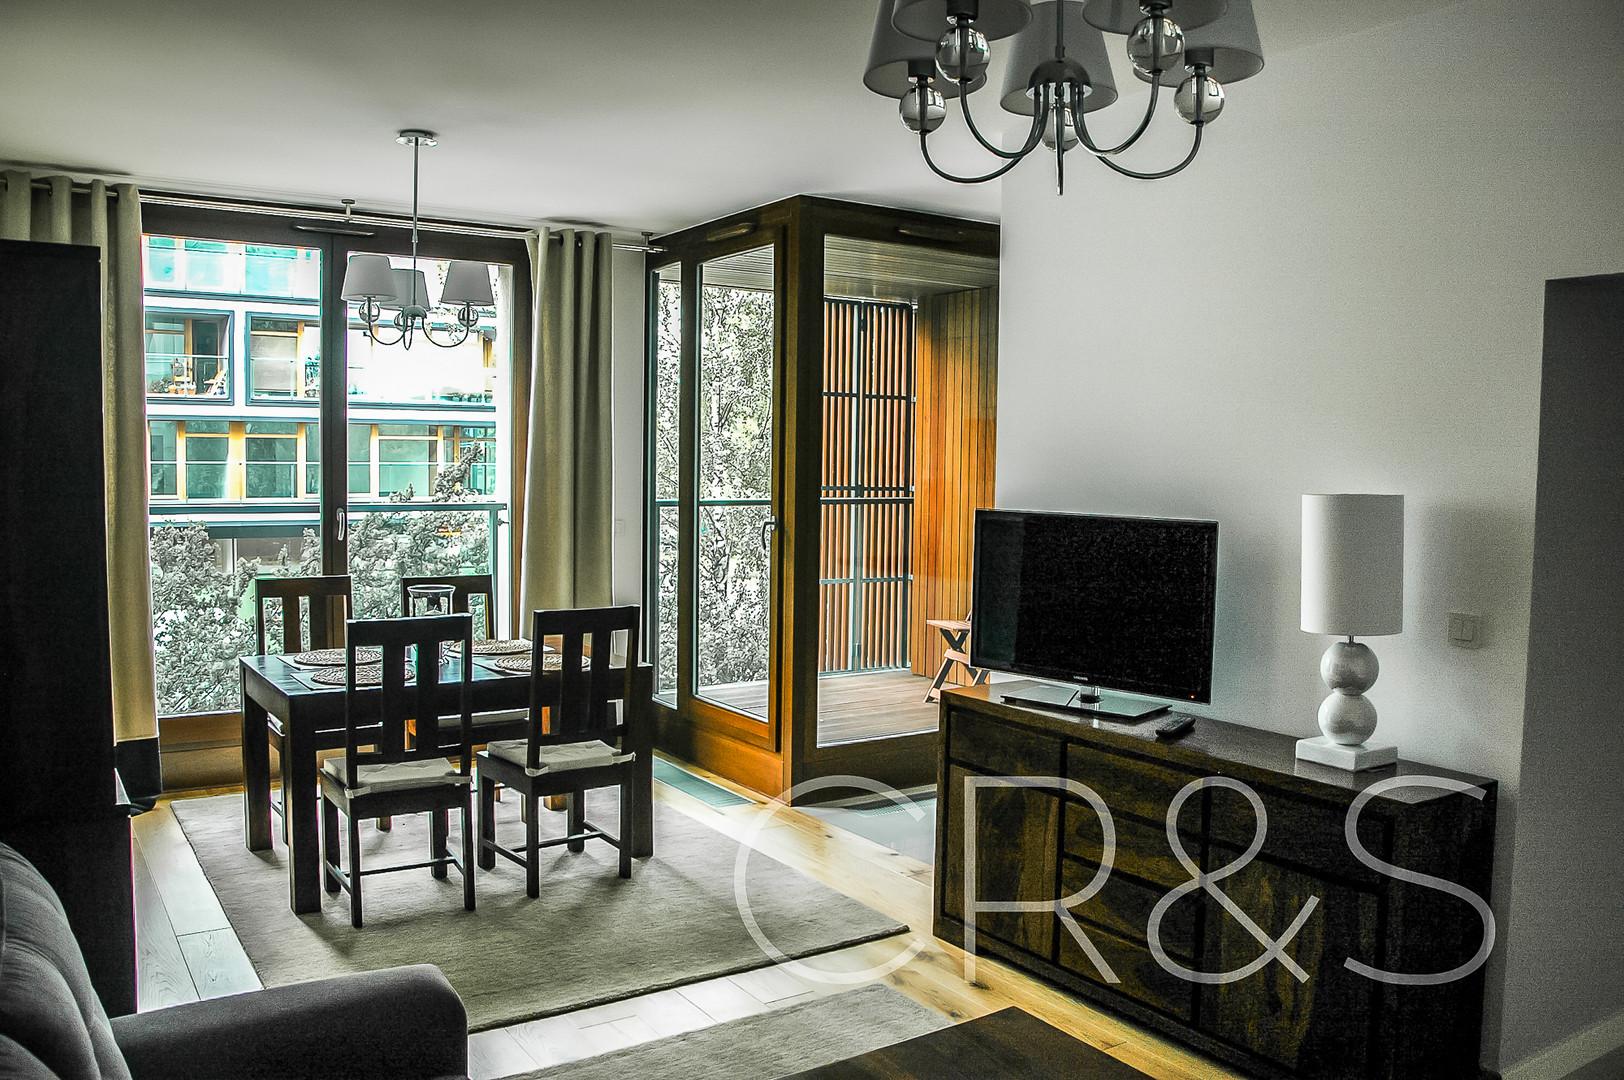 Apartments for rent Kolejowa Warsaw_0833